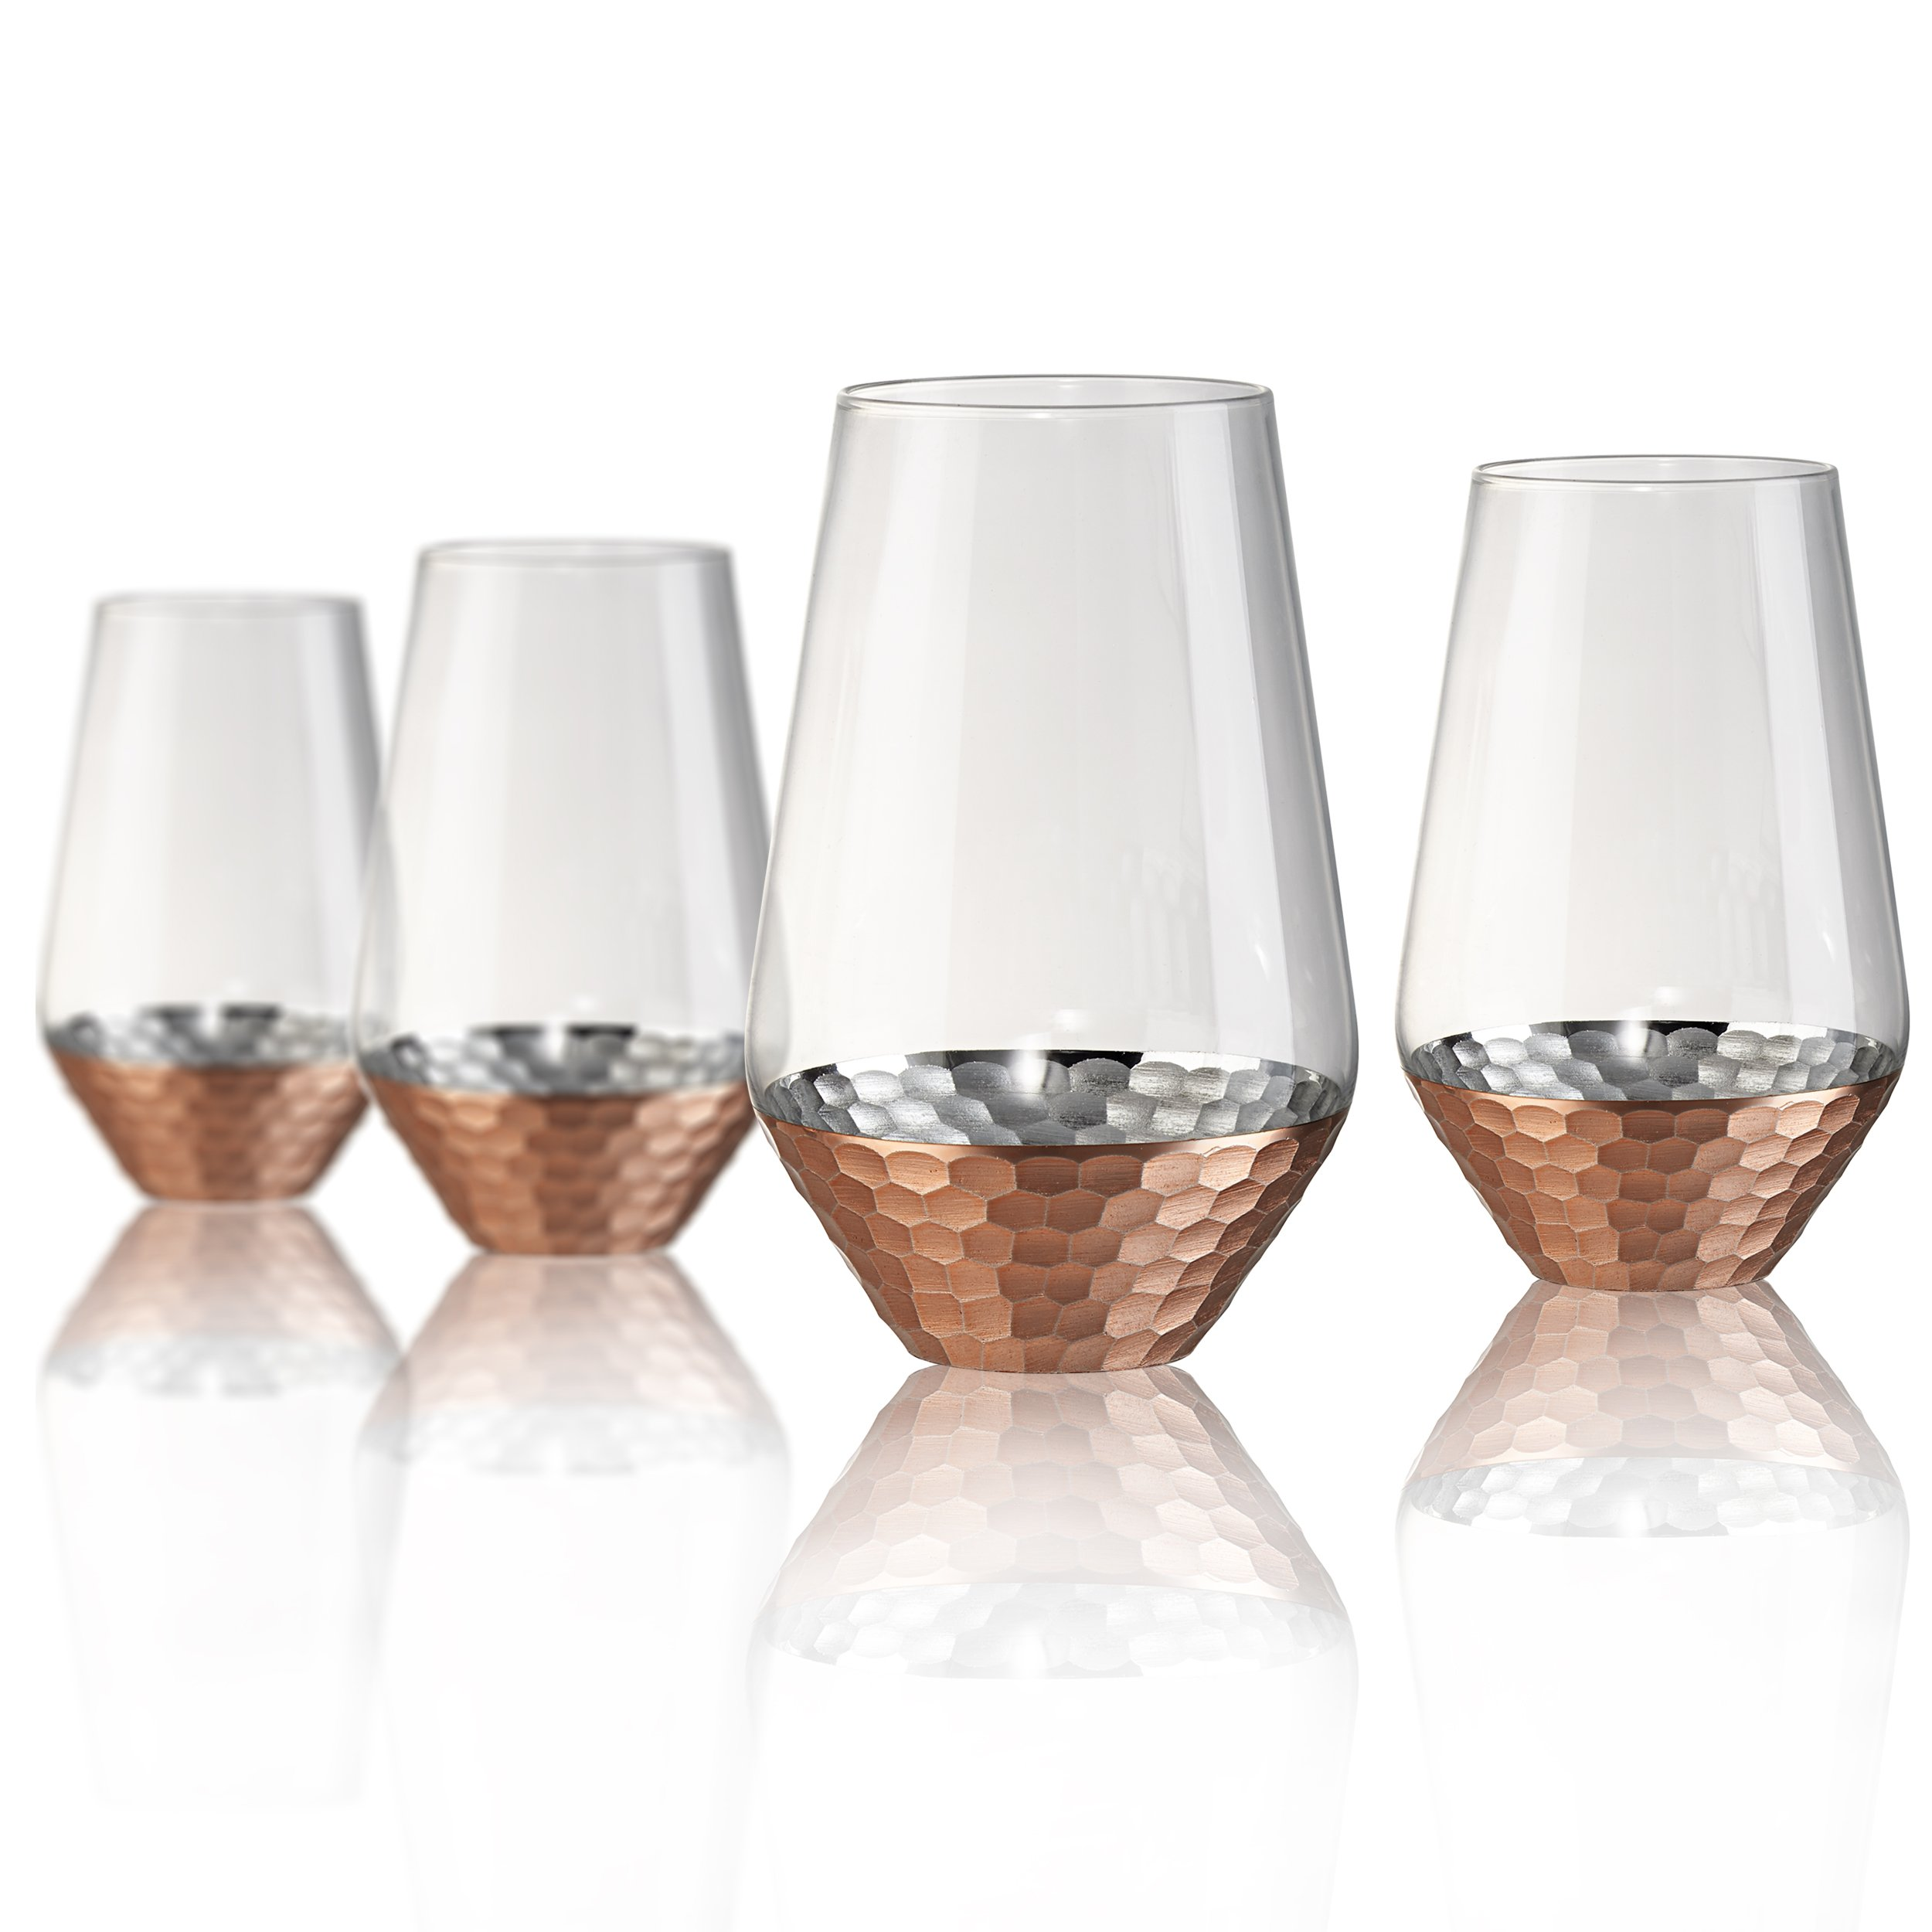 Artland Coppertino Hammer Highball Glasses, Set of 4, 17 oz, Clear